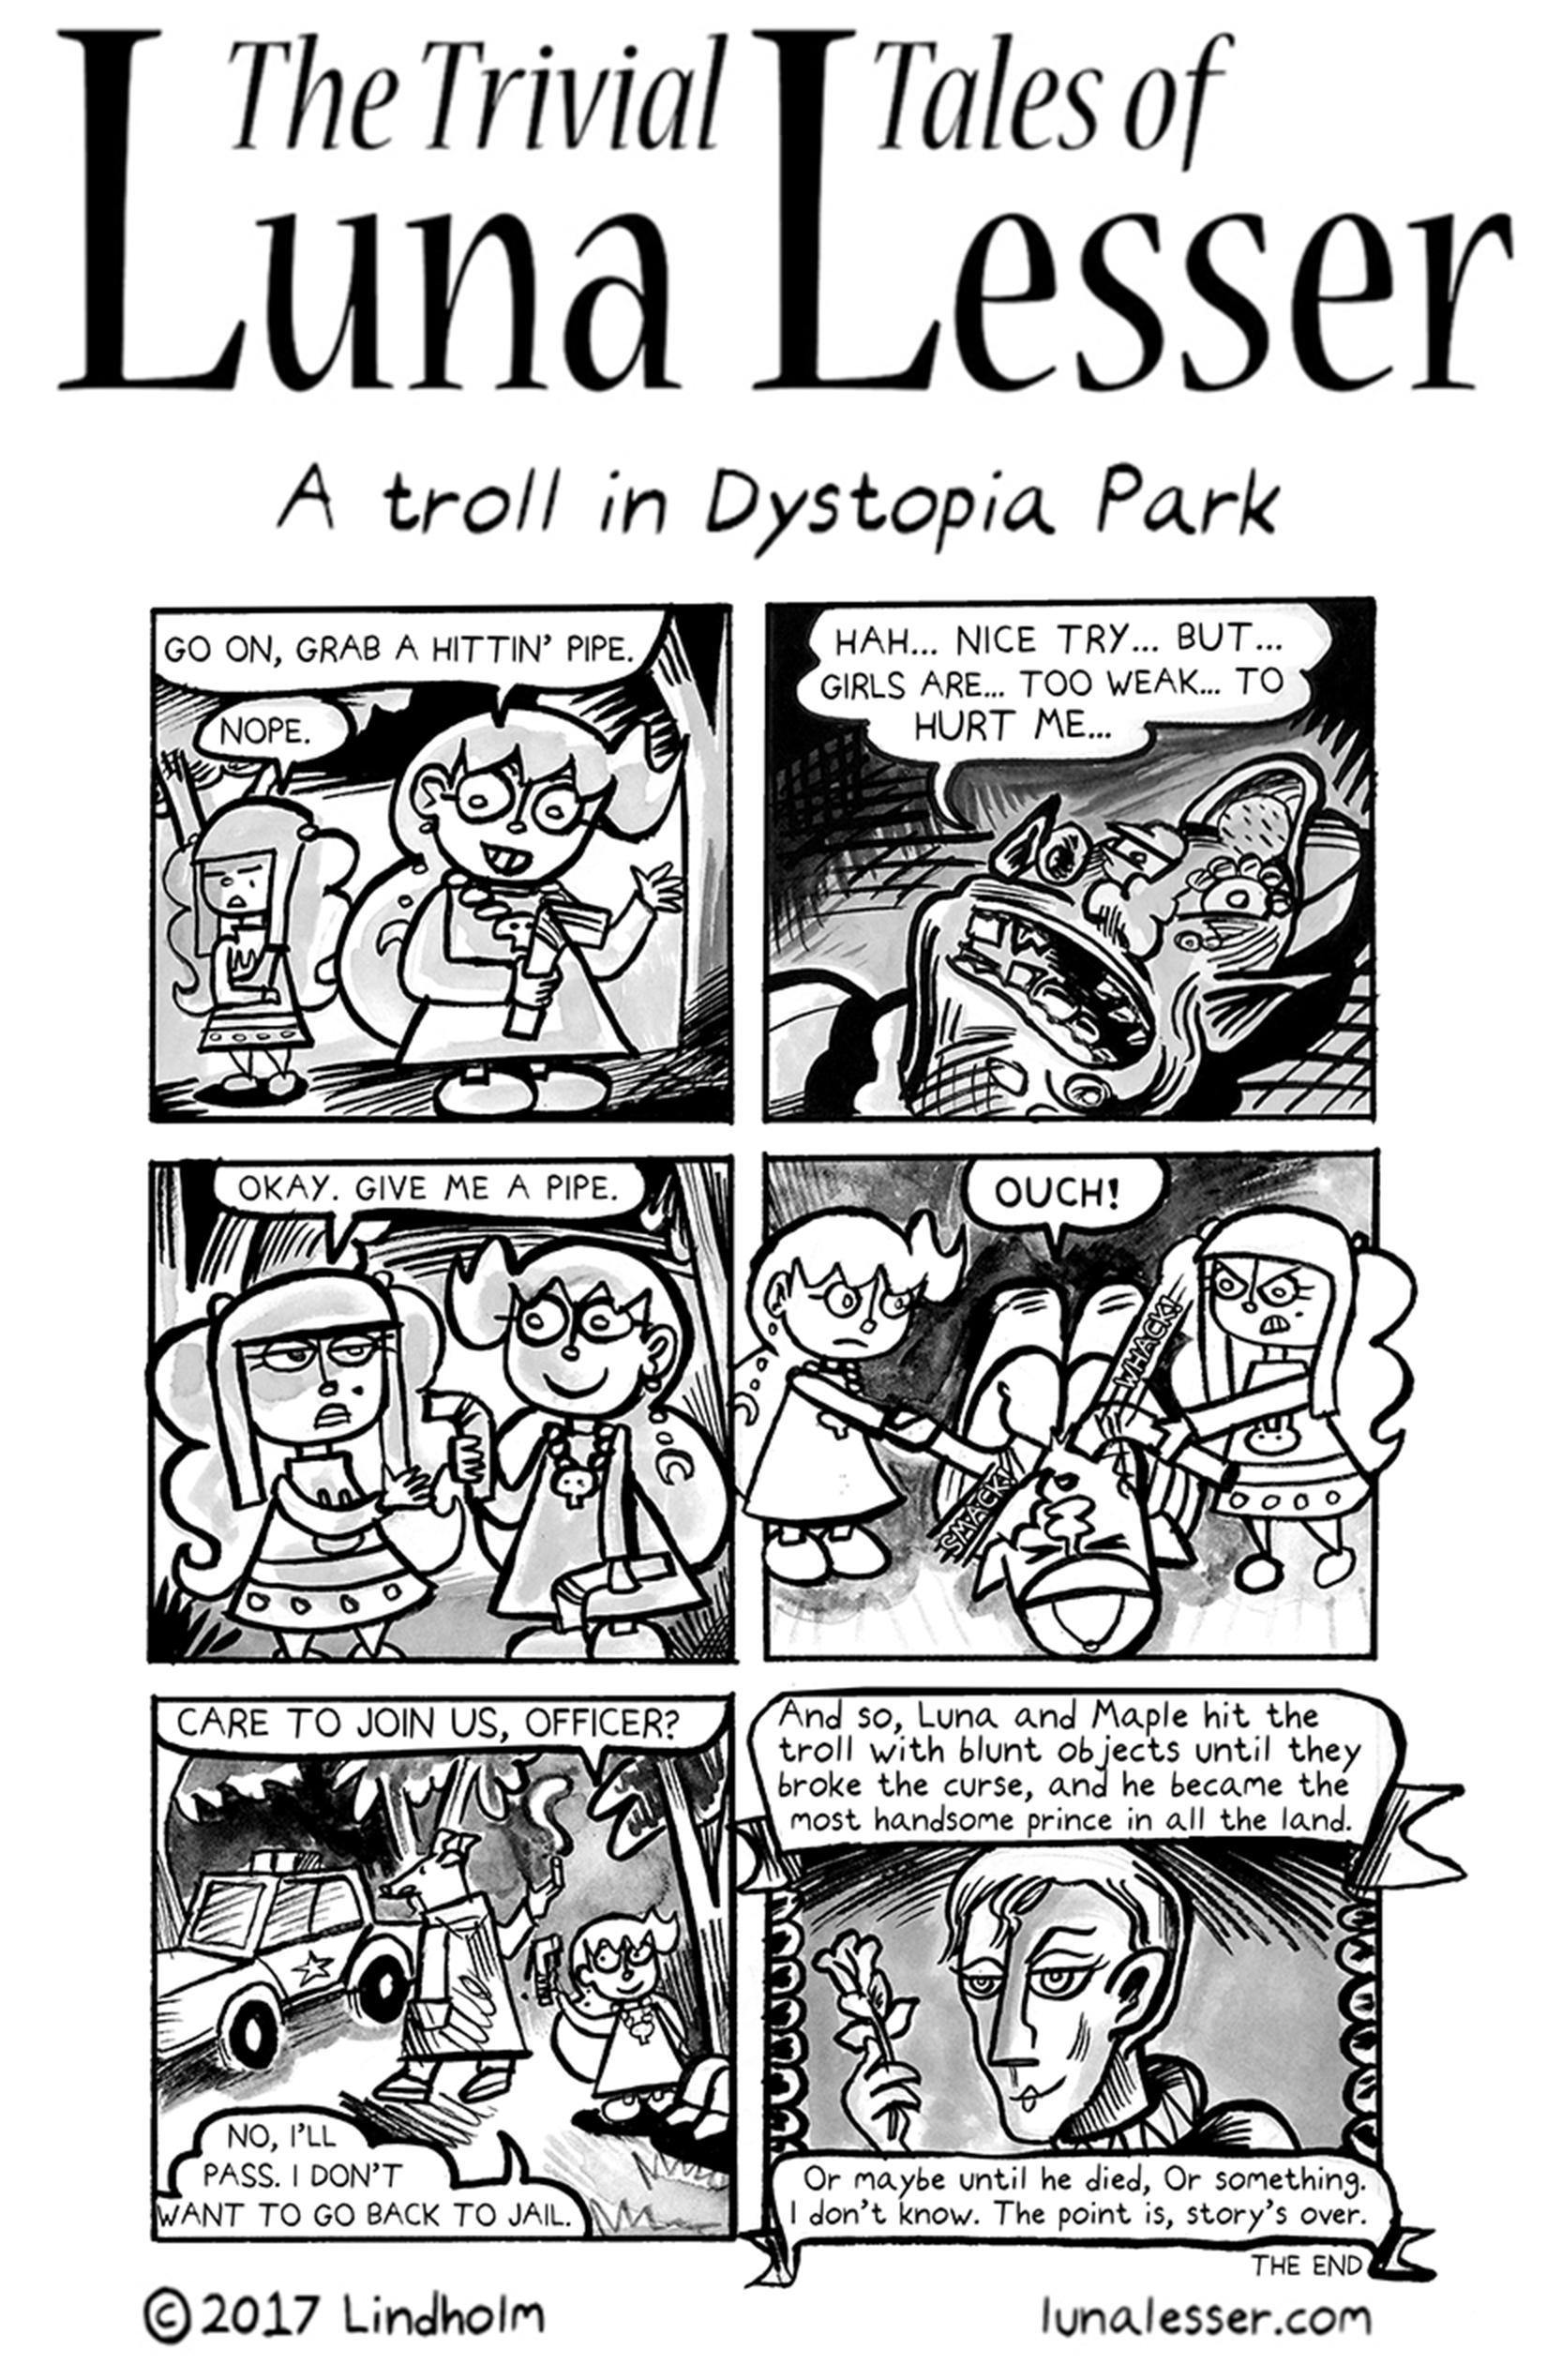 A troll in Dystopia Park (8/8)